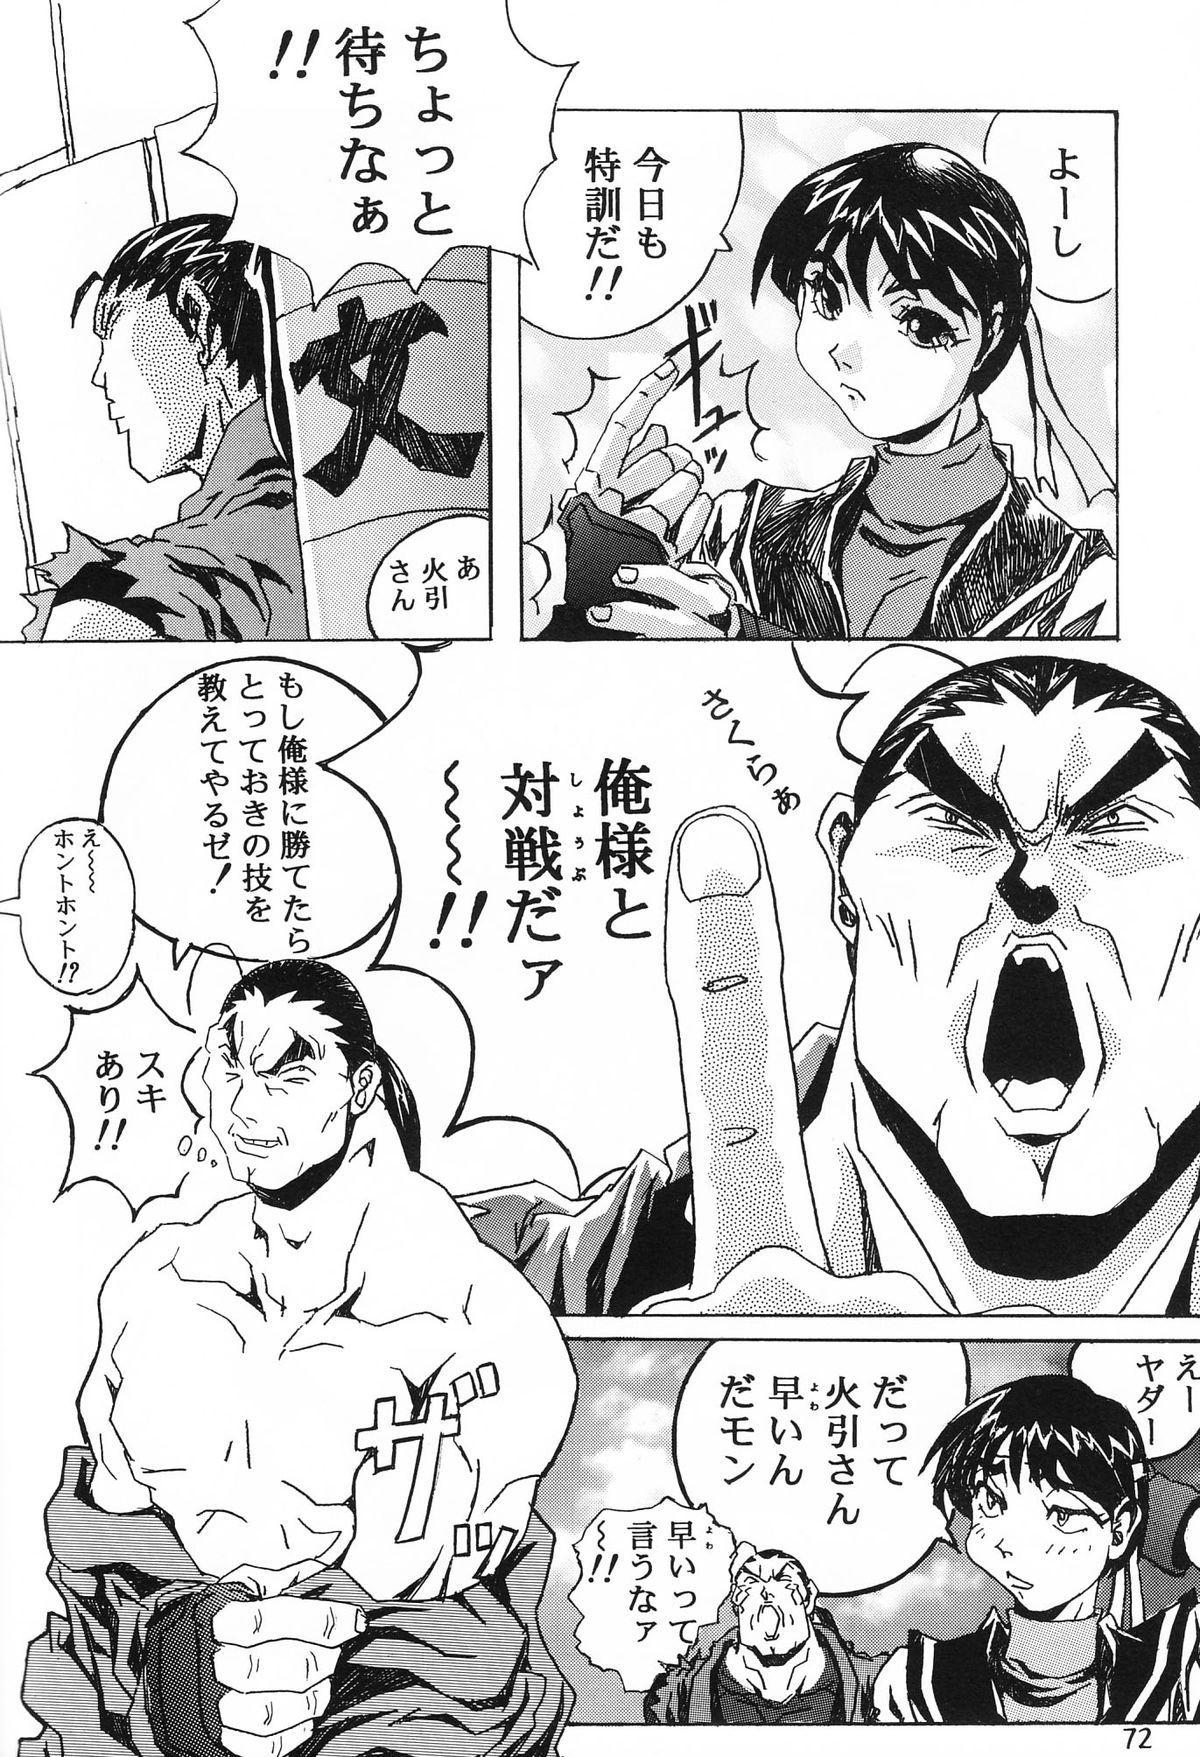 Henrei-kai '98 Natsu SPECIAL 71